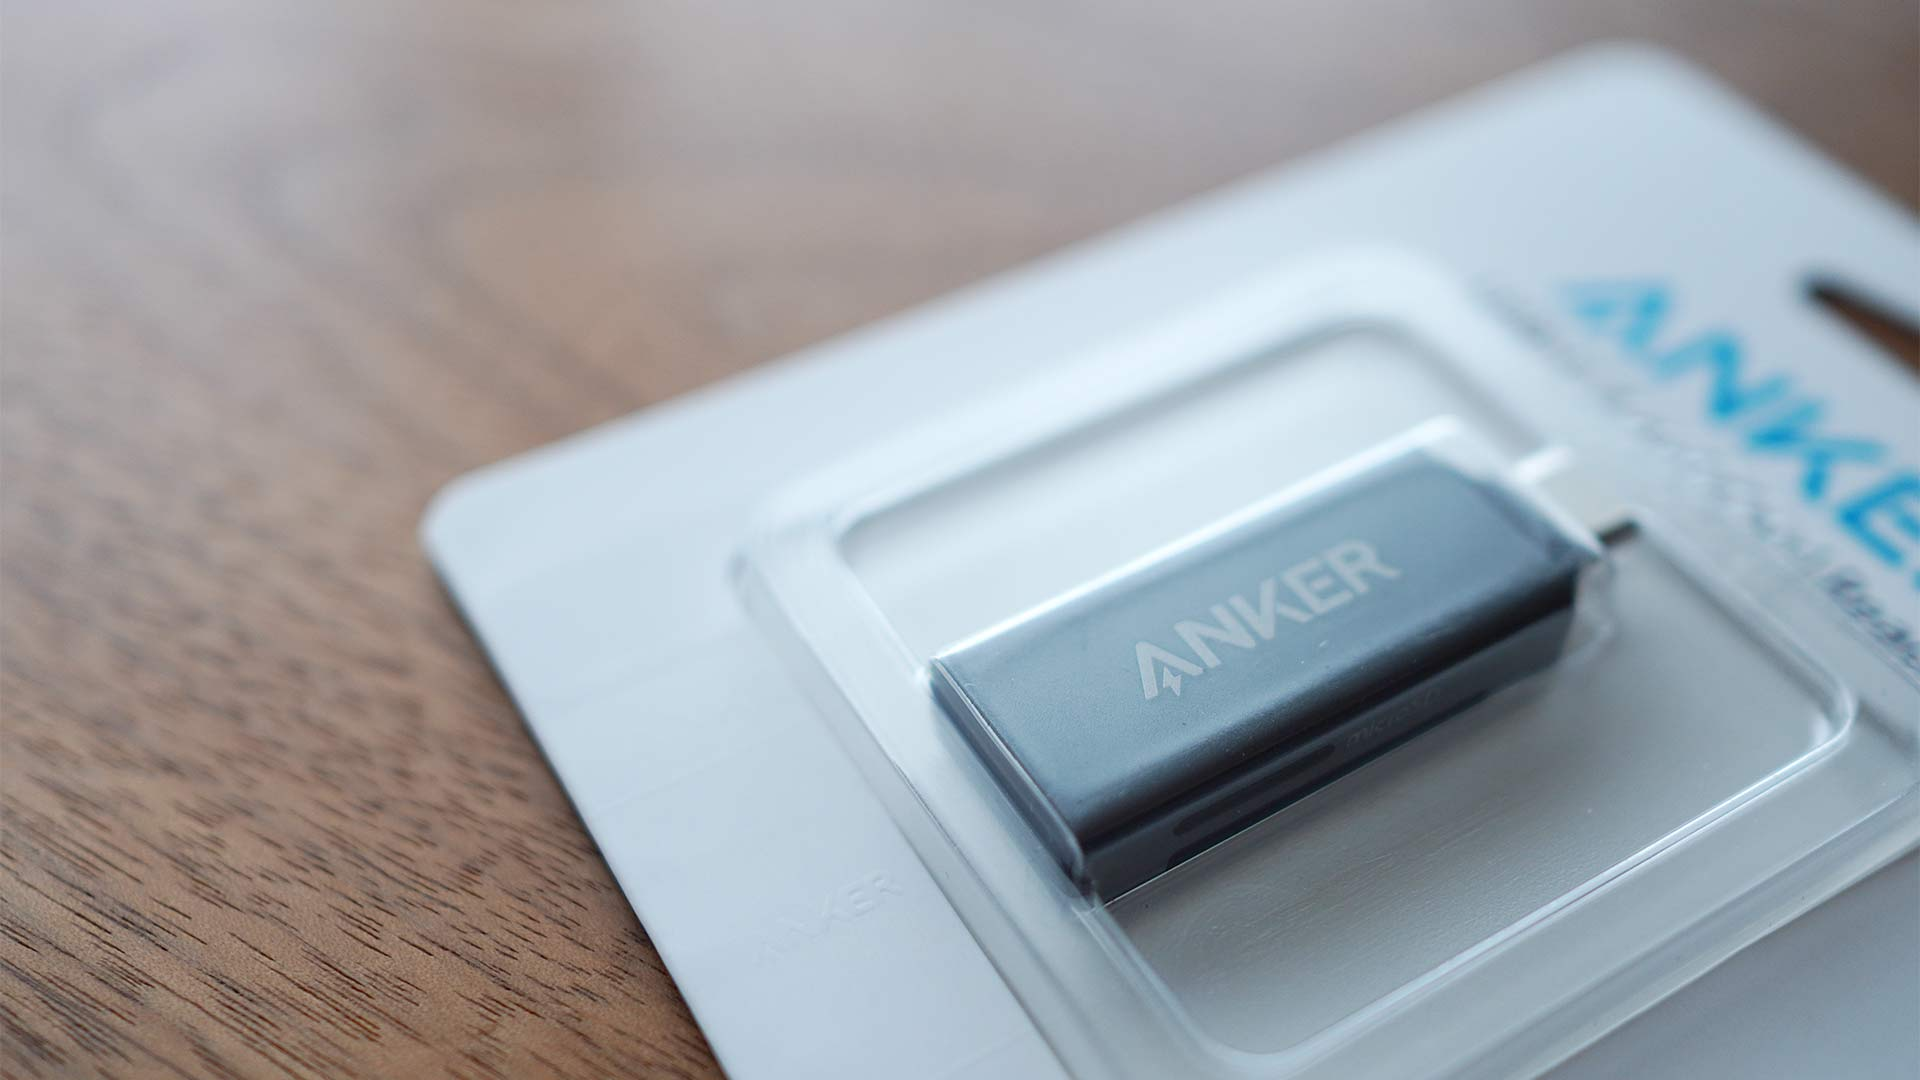 SDカードリーダー,メモリーカードリーダー,Anker,小さい,microsd,sd,